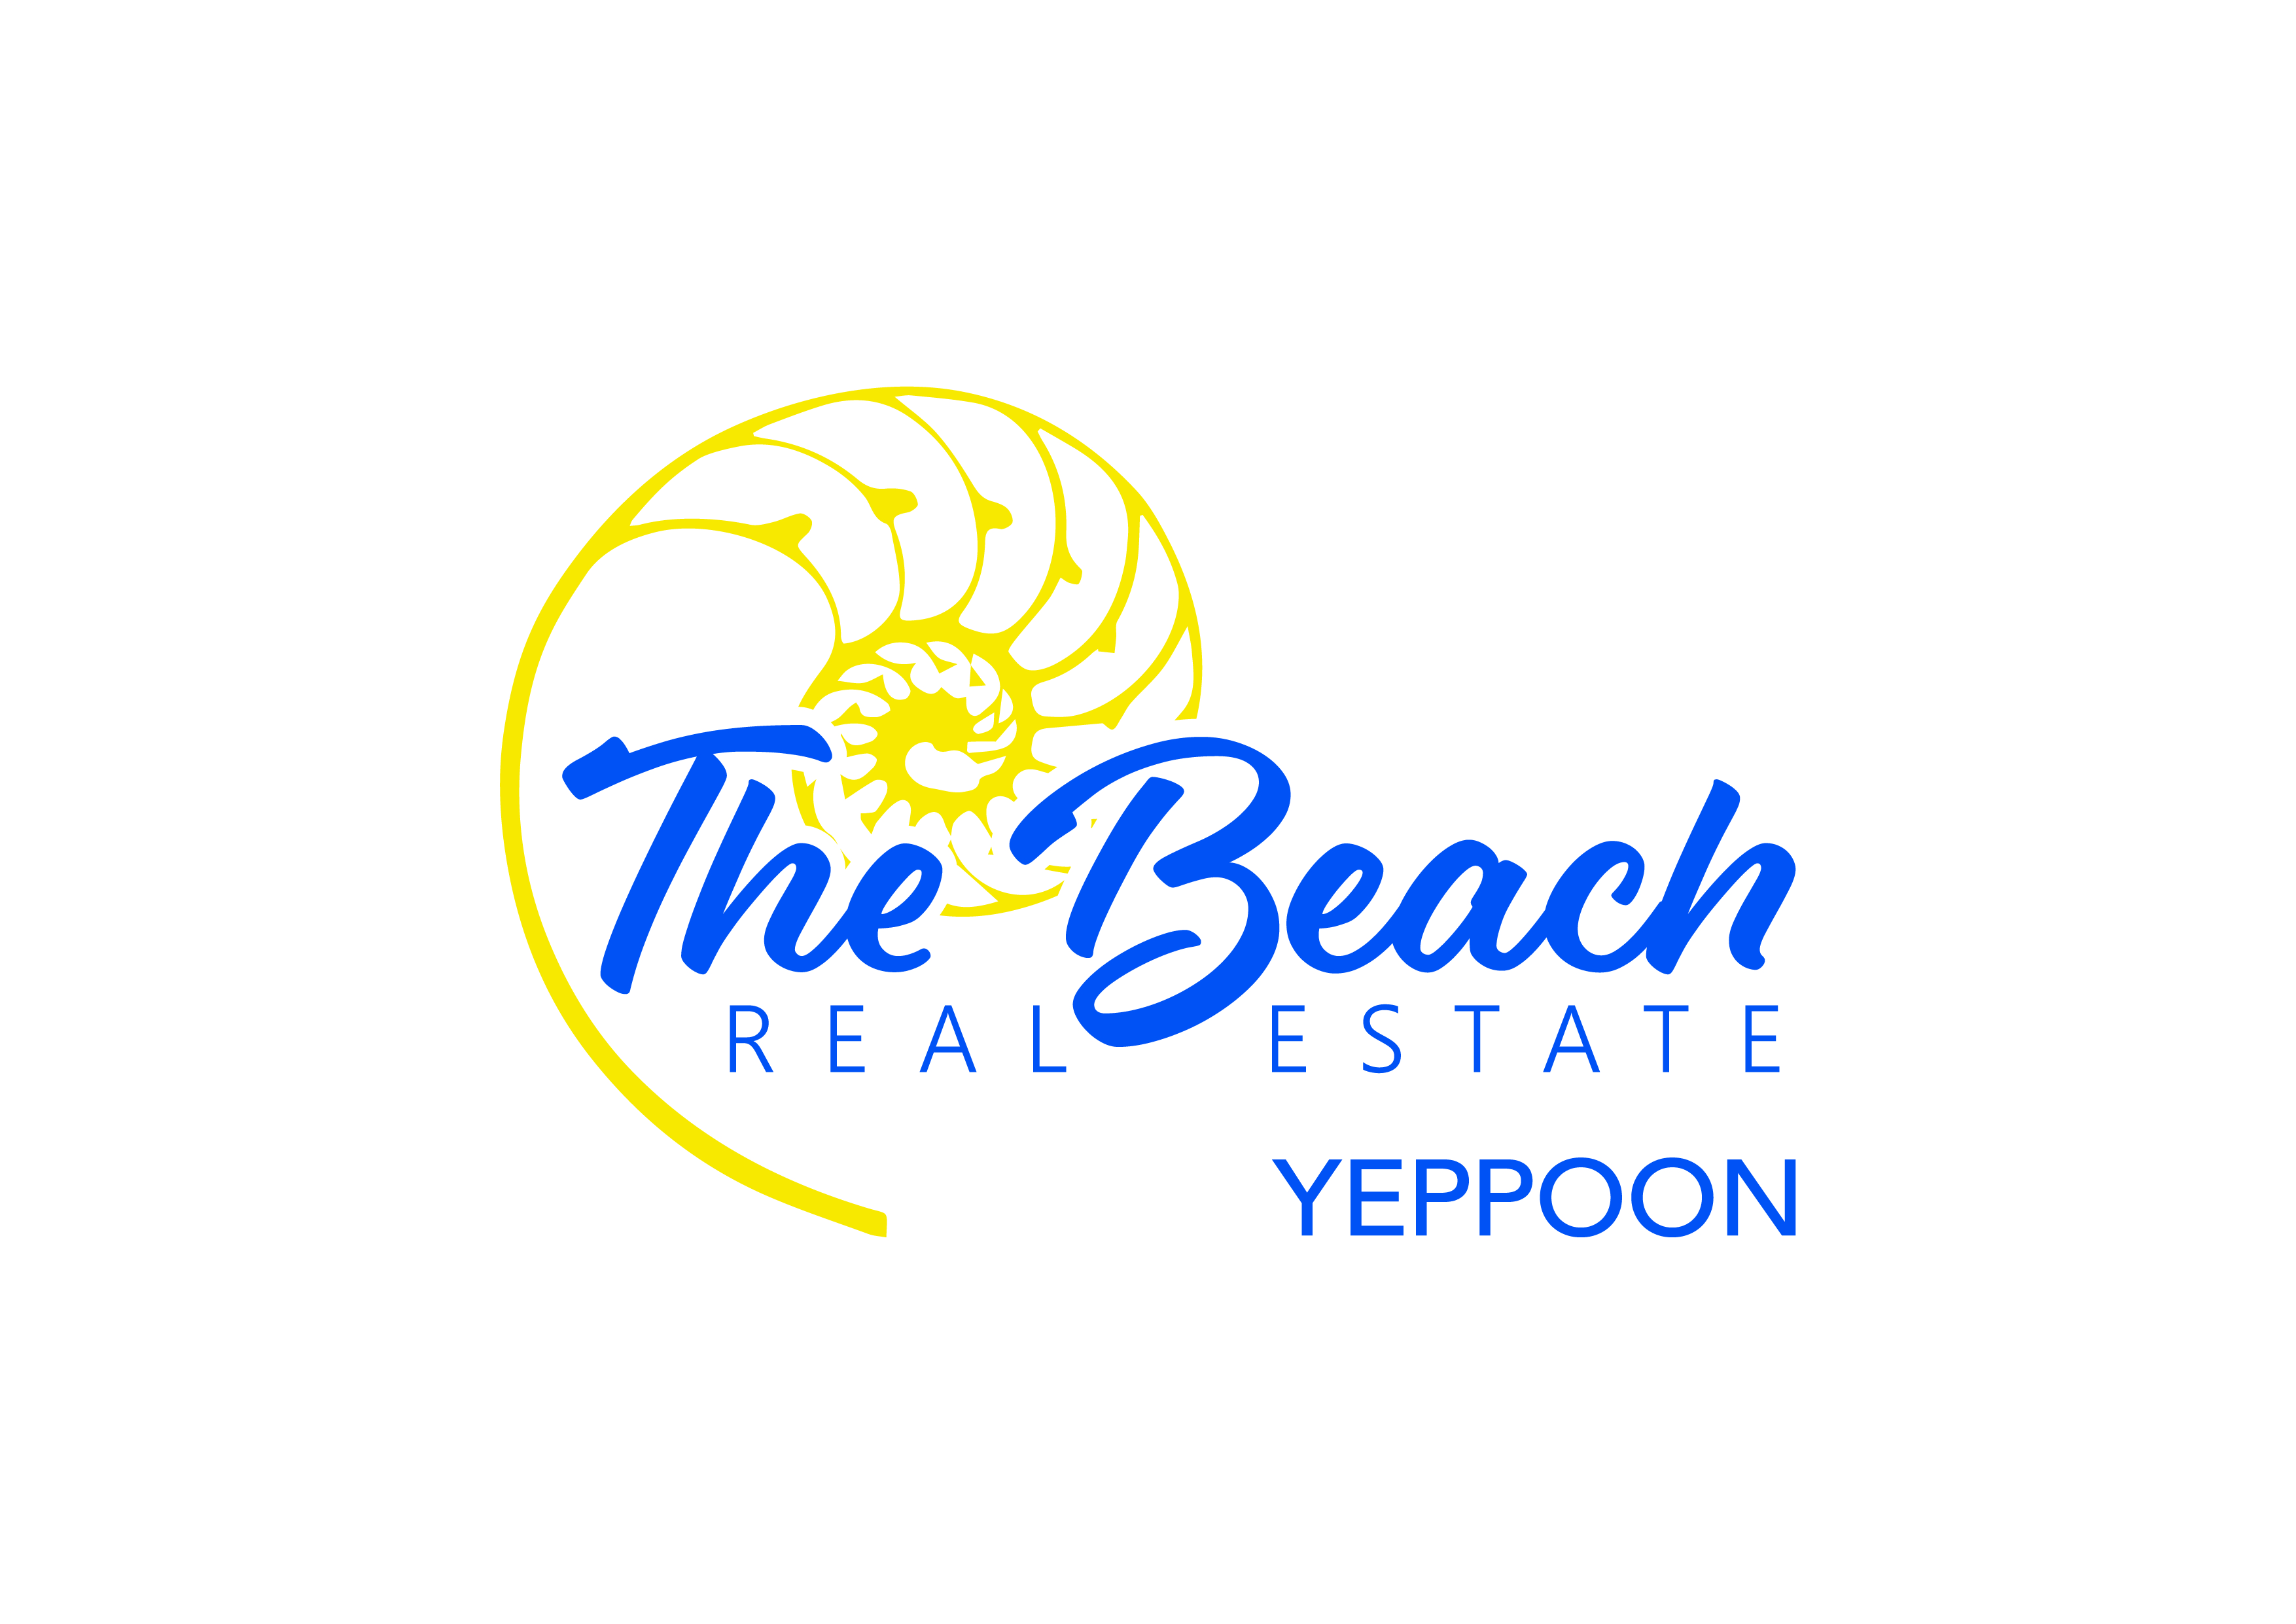 @ The Beach Real Estate Yeppoon